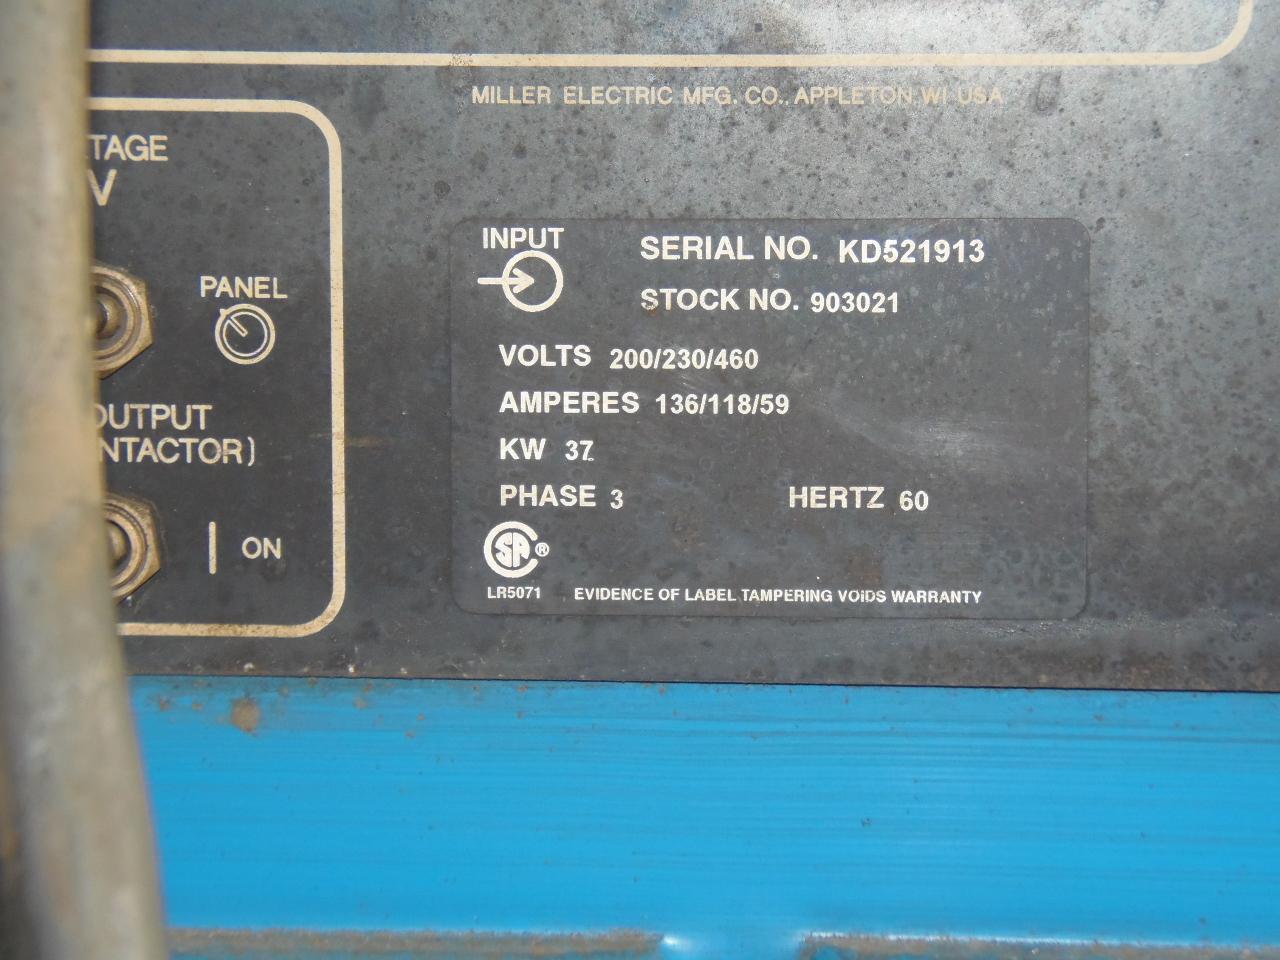 Miller 650 Amp Wire Feed Welder, model Deltaweld 651 with D64 feeder